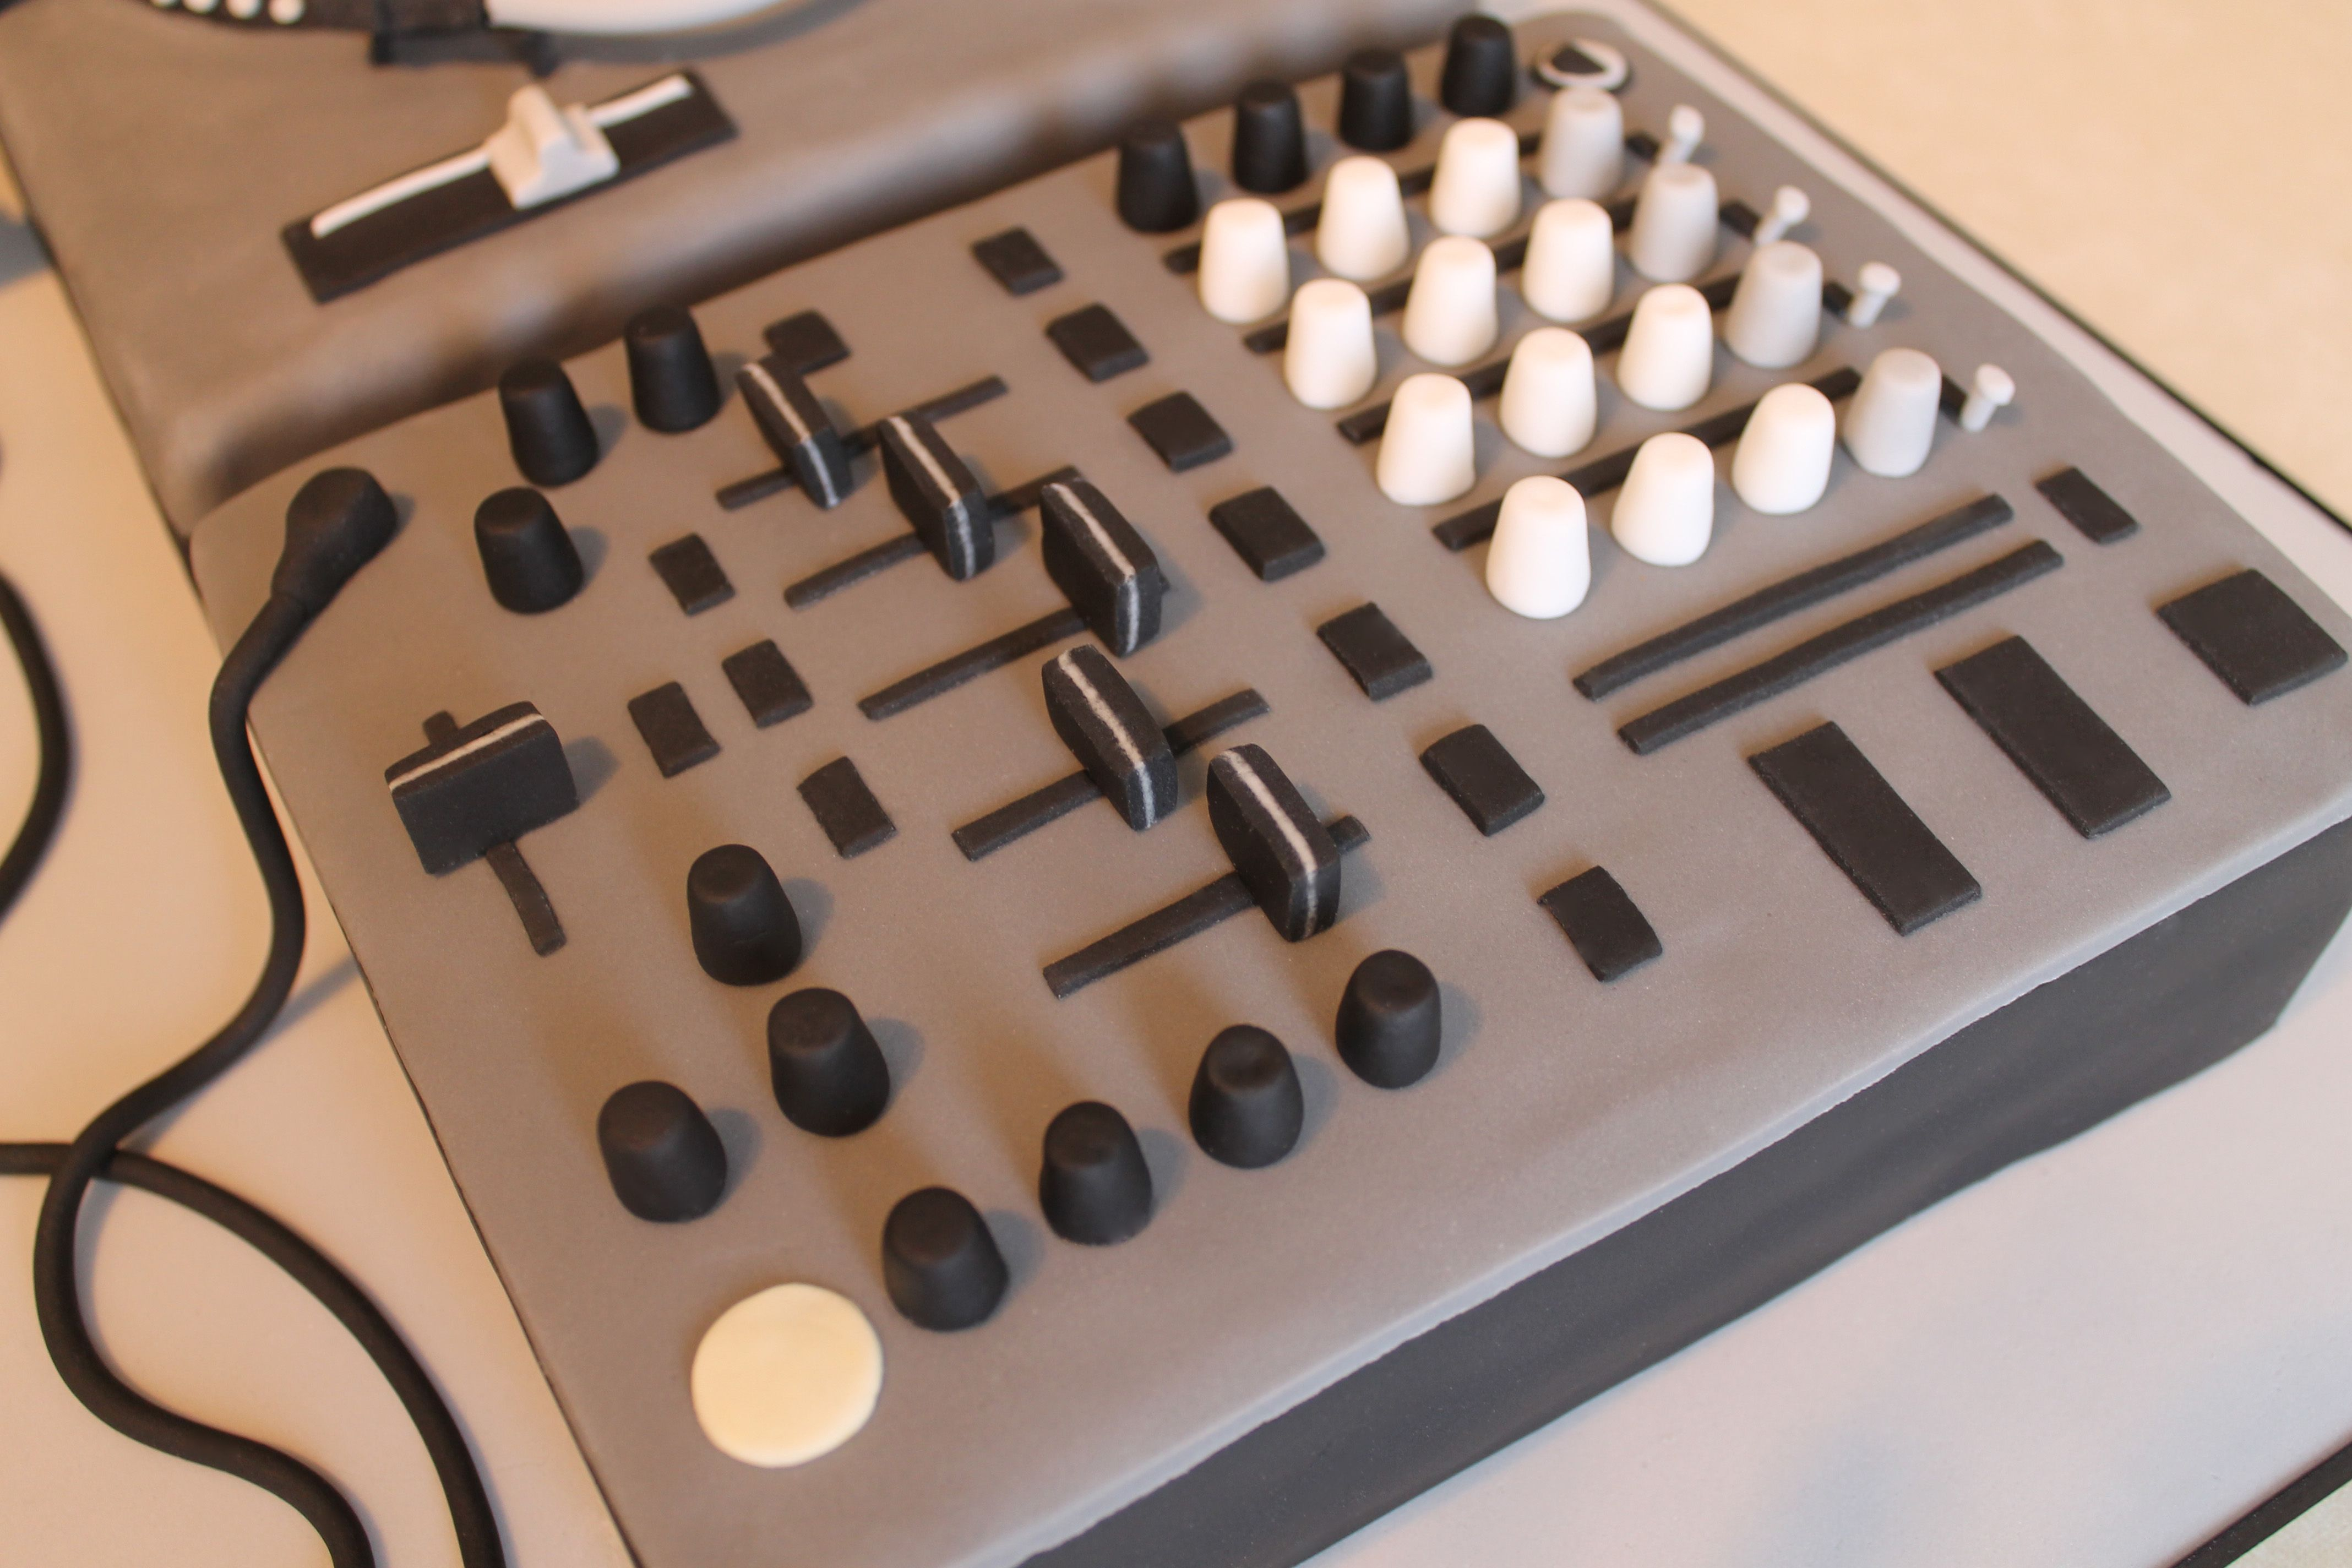 Mixer (DJ Turntable Cake)